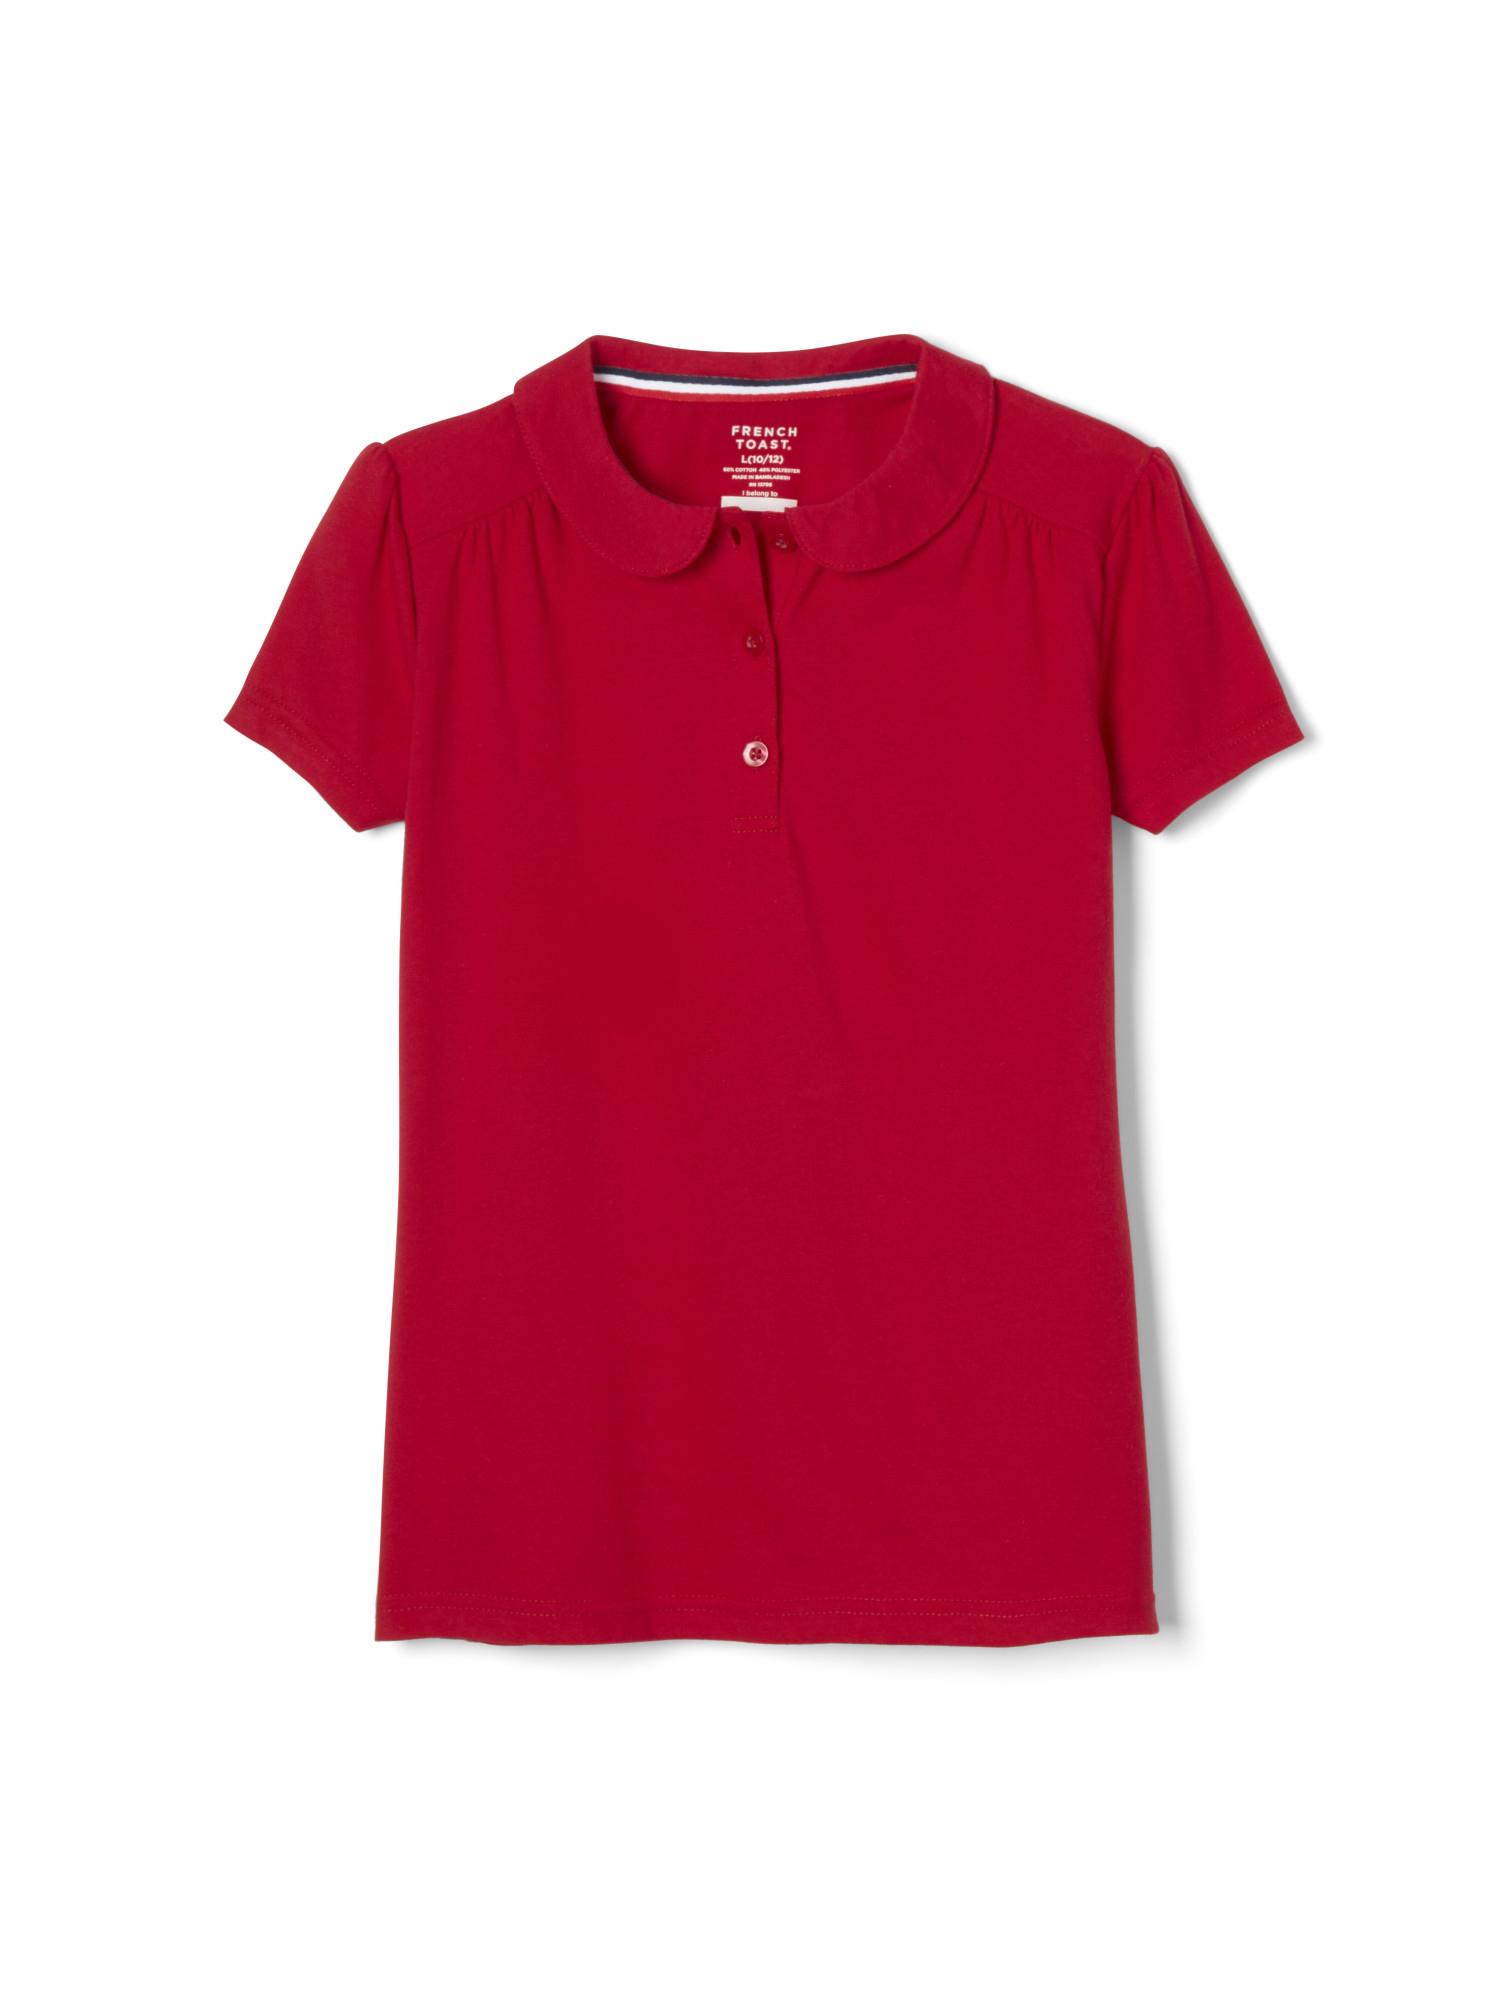 Uneek Kids Polo Shirt Childrens School Top PE Tee T Boys Girls Classic Poloshirt